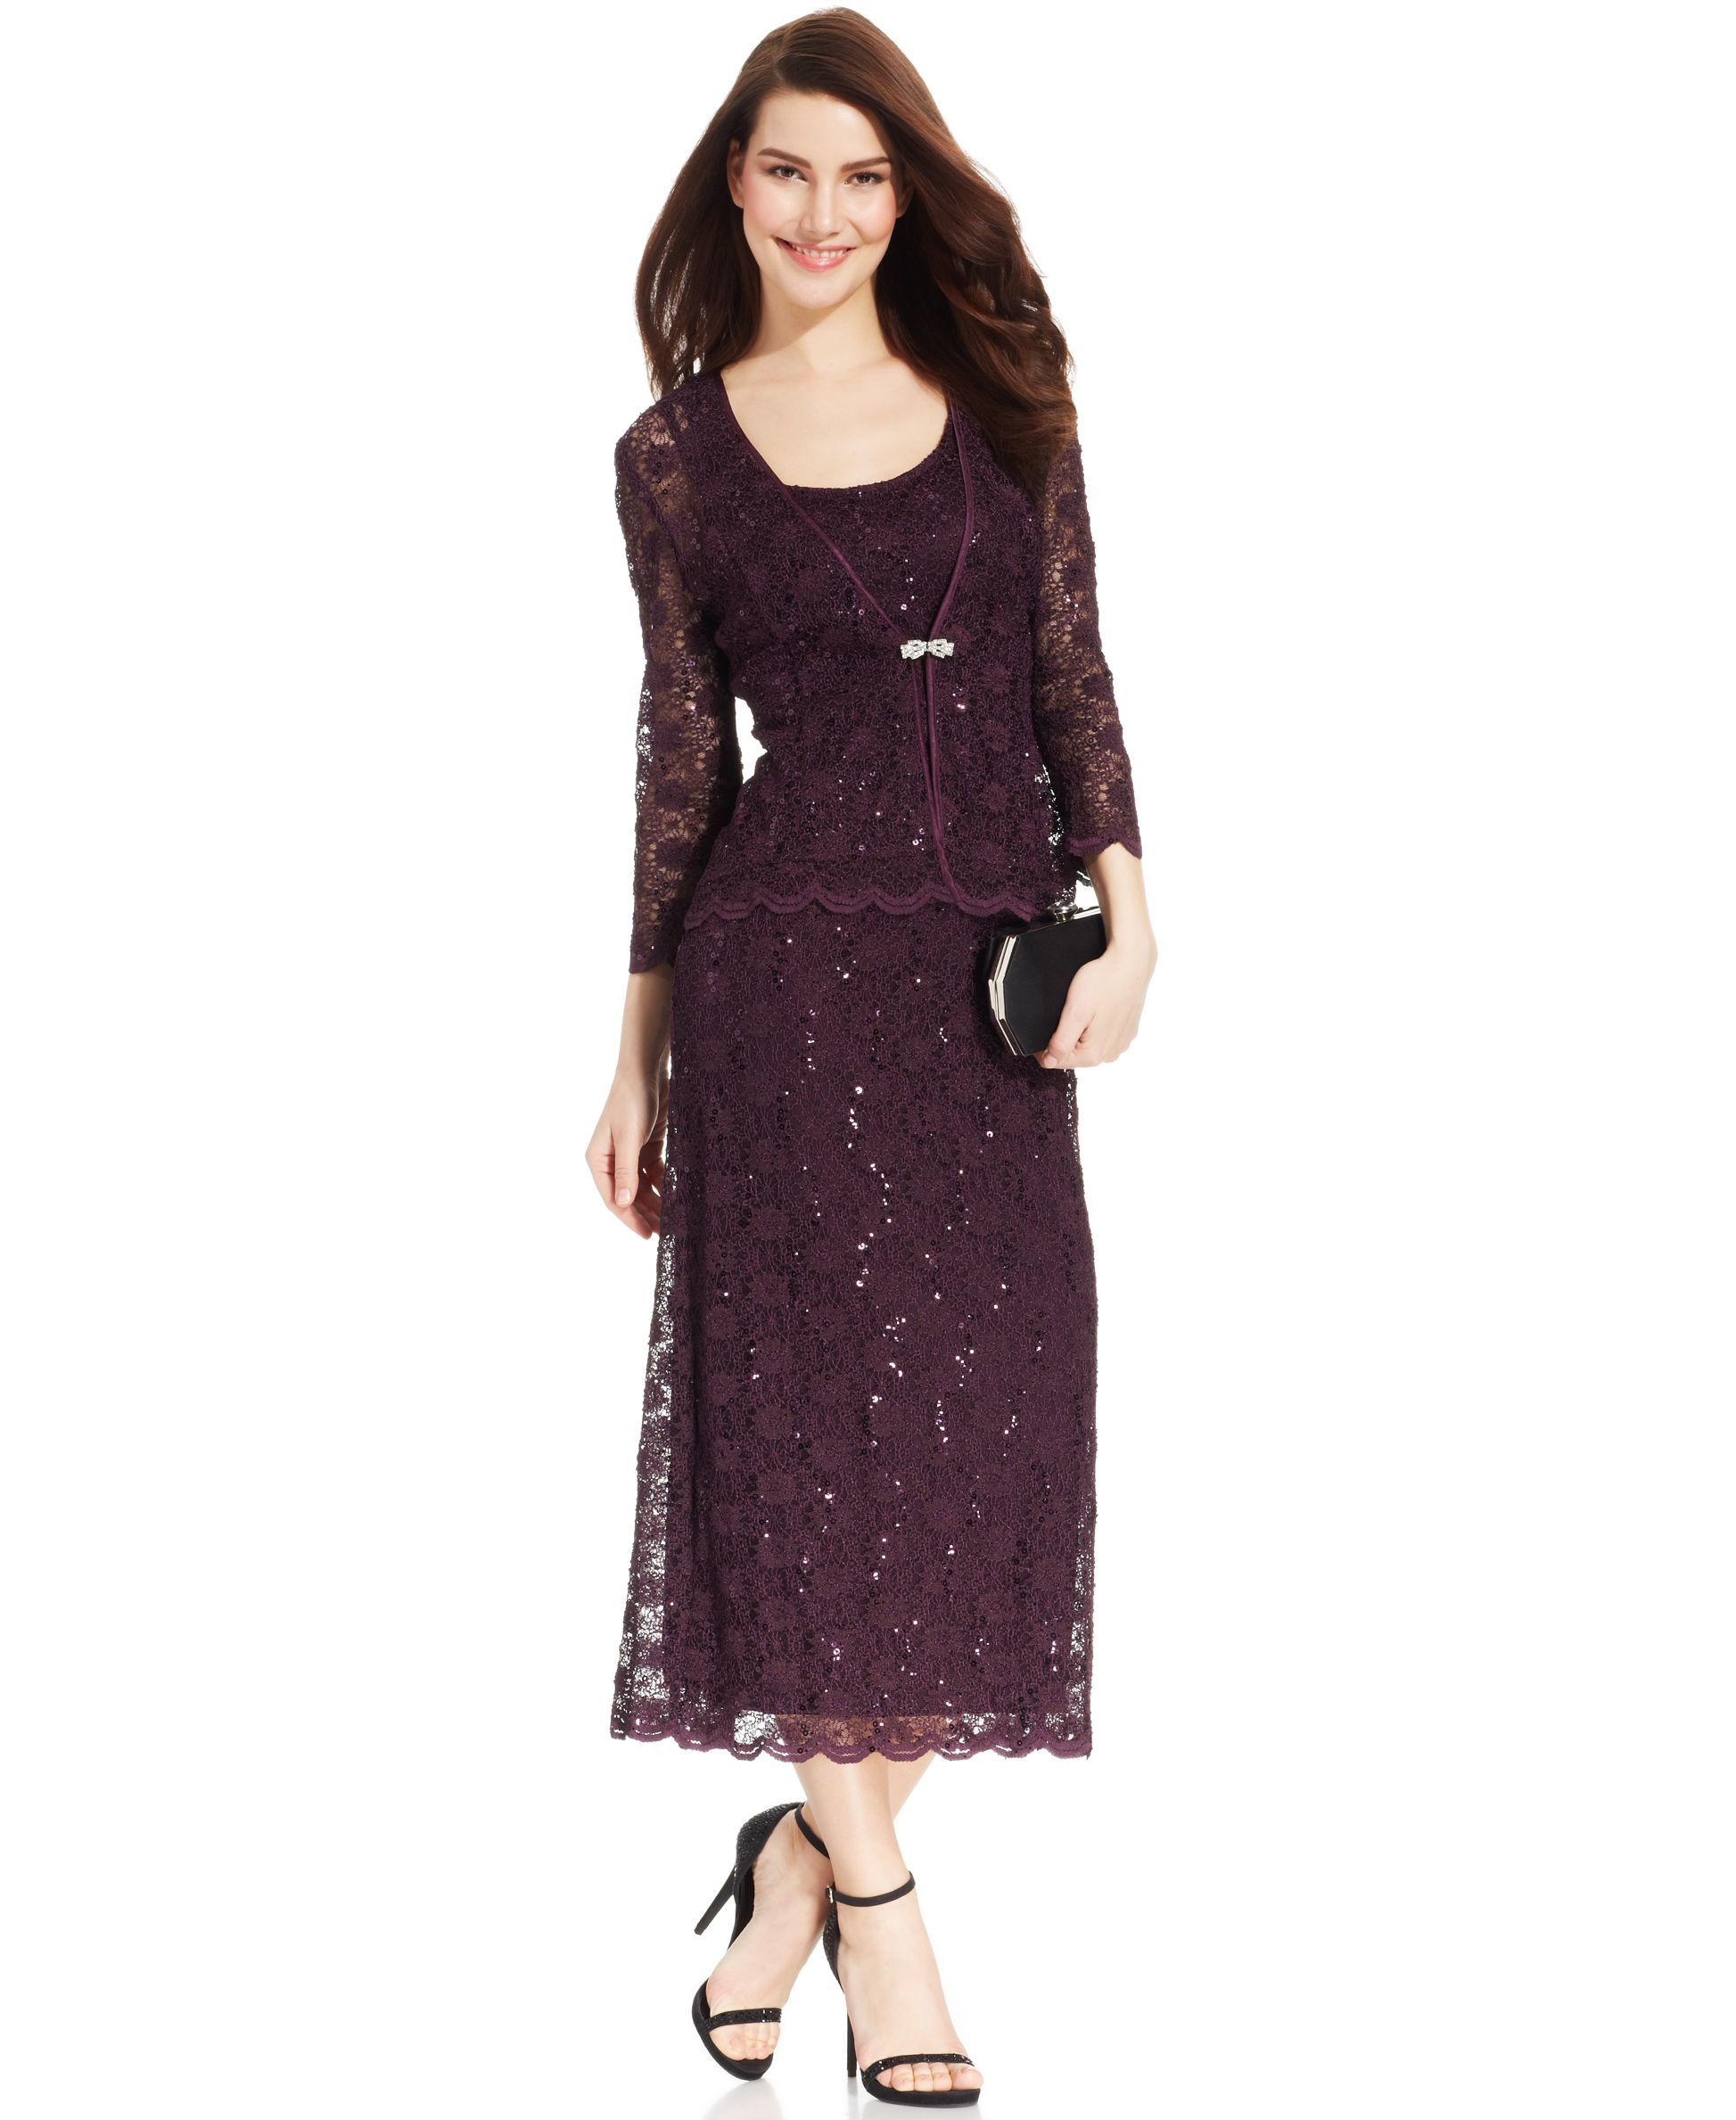 Lace dress jacket  RuM Richards Sleeveless Sequined Lace Dress and Jacket  Products